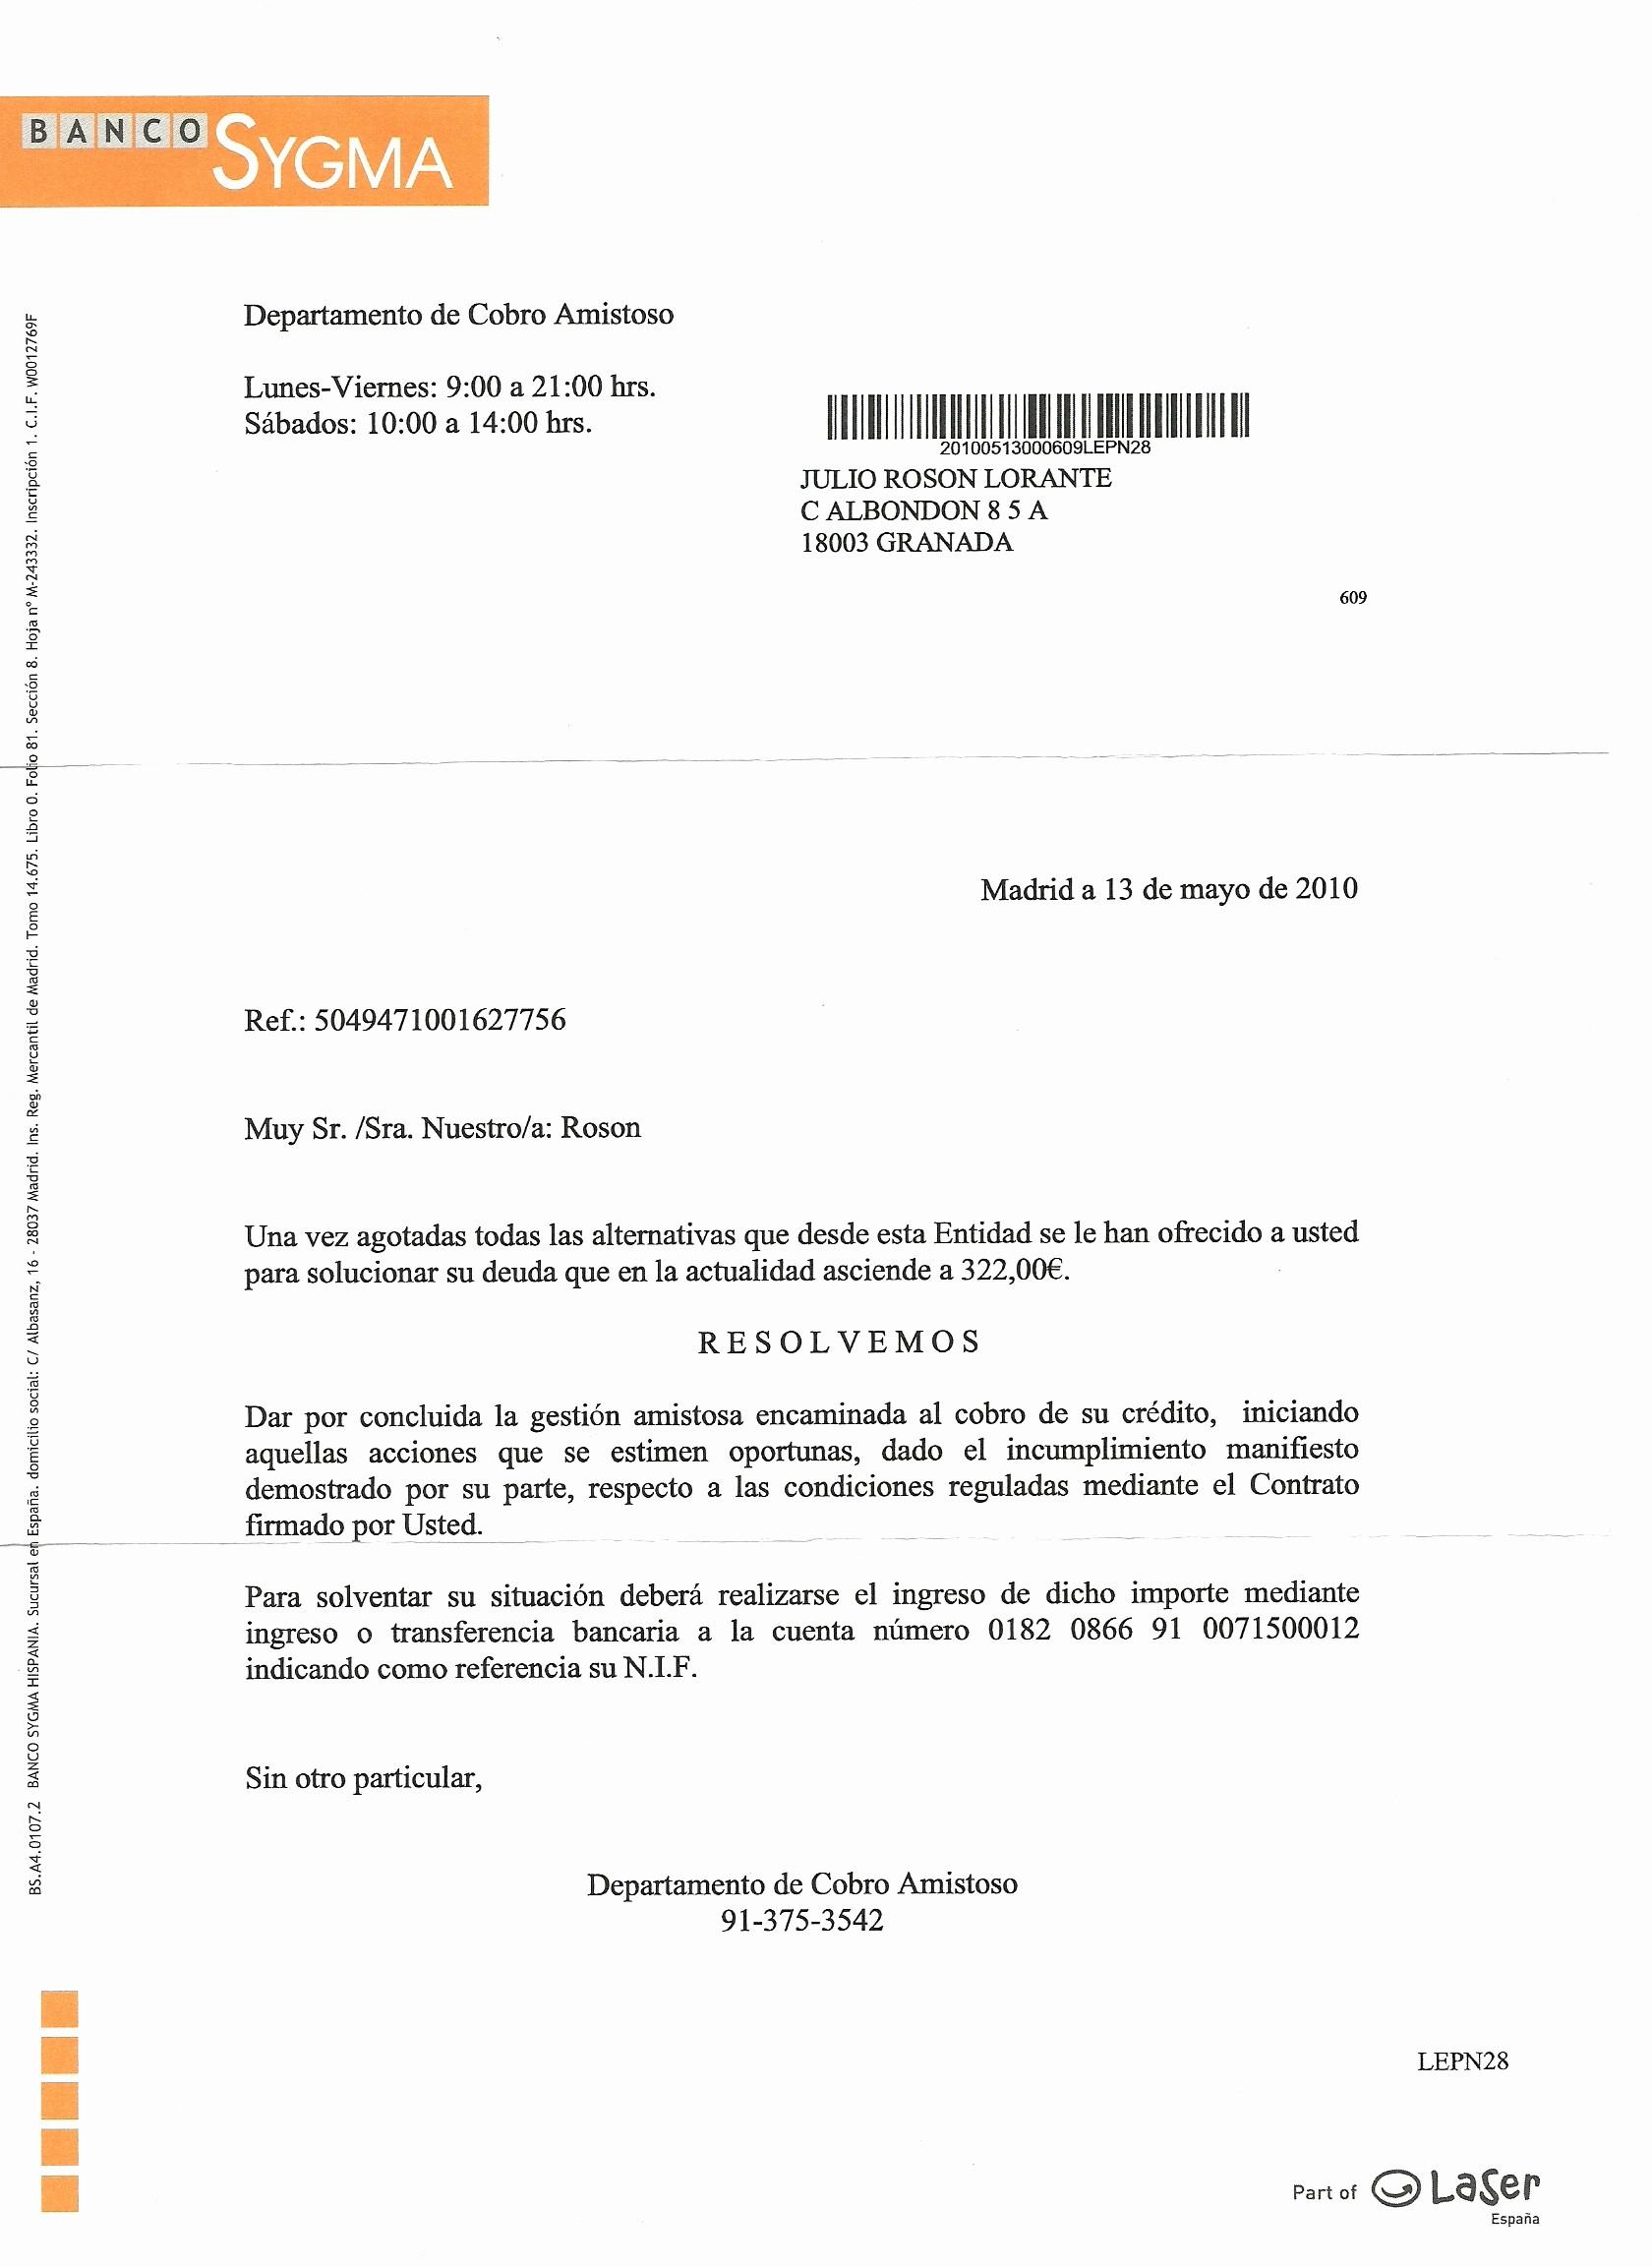 Carta De Cobro De Deuda Inspirational asnef Equifax